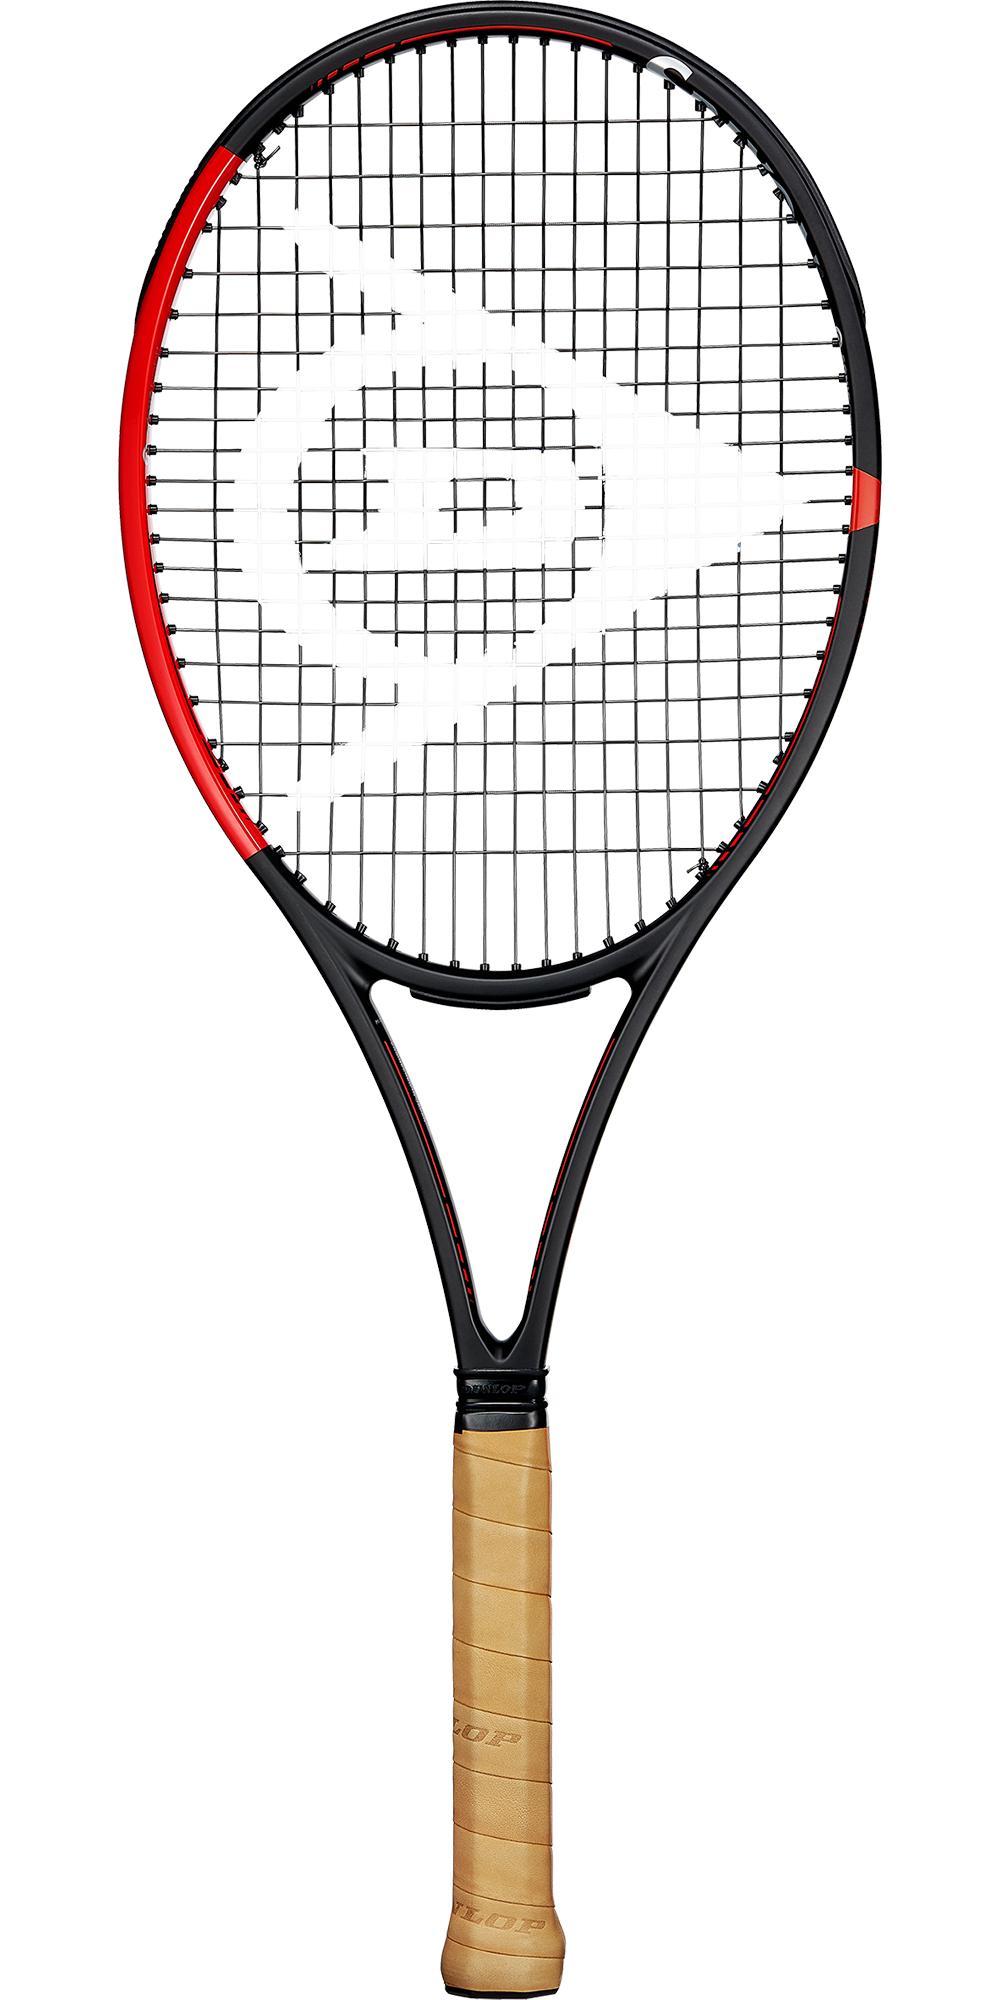 Dunlop Srixon CX 200 Tour 18x20 Tennis Racket  Frame Only  - Tennisnuts.com 2c02ad69f4